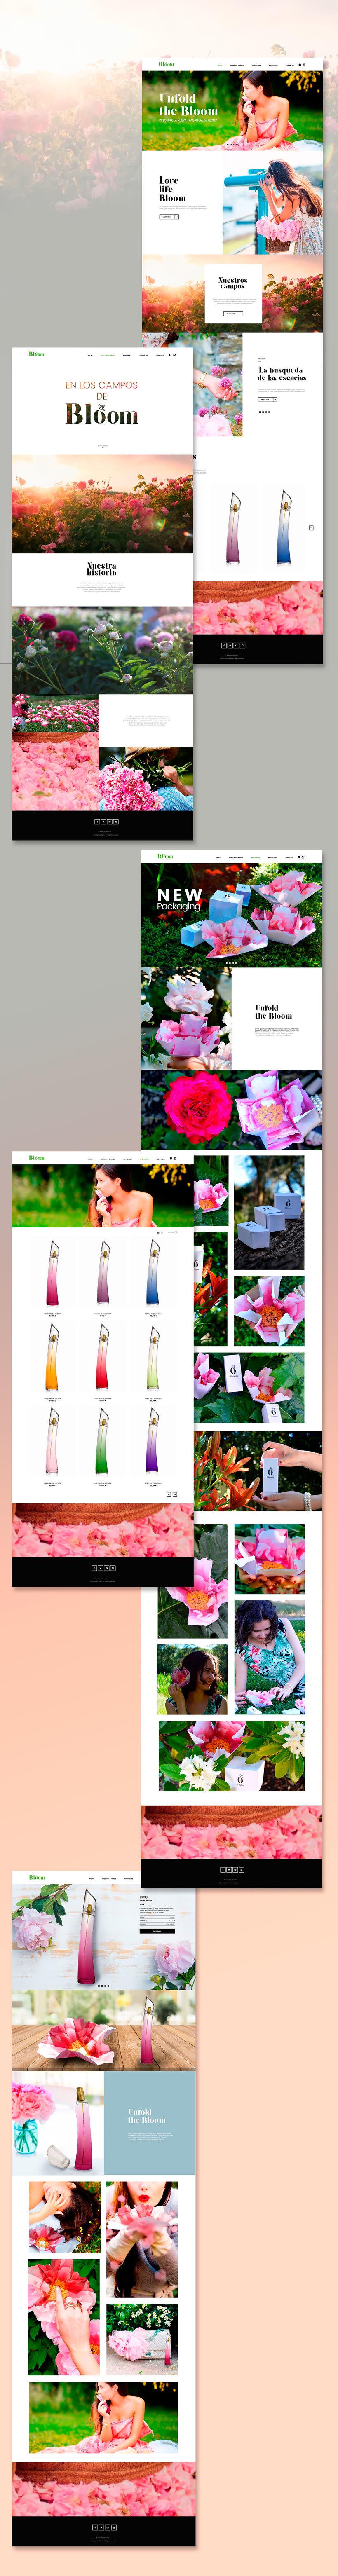 Bloom, perfume 8